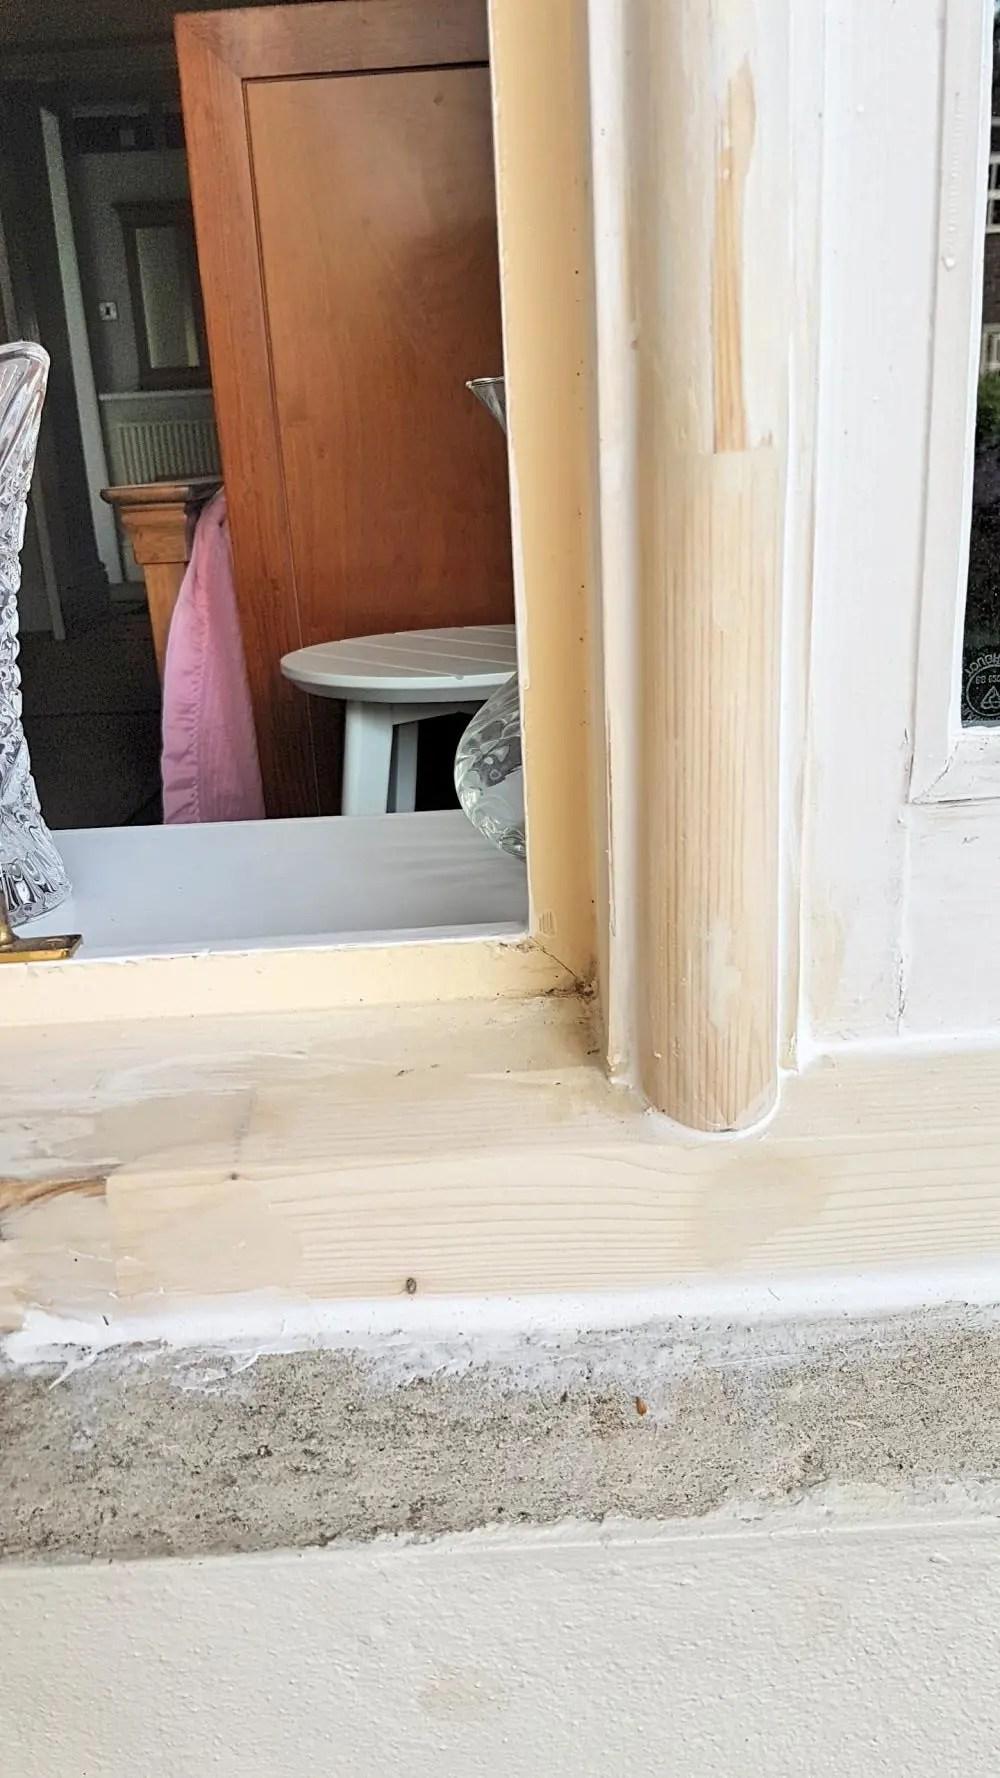 Shotton Hall Window Repair #1